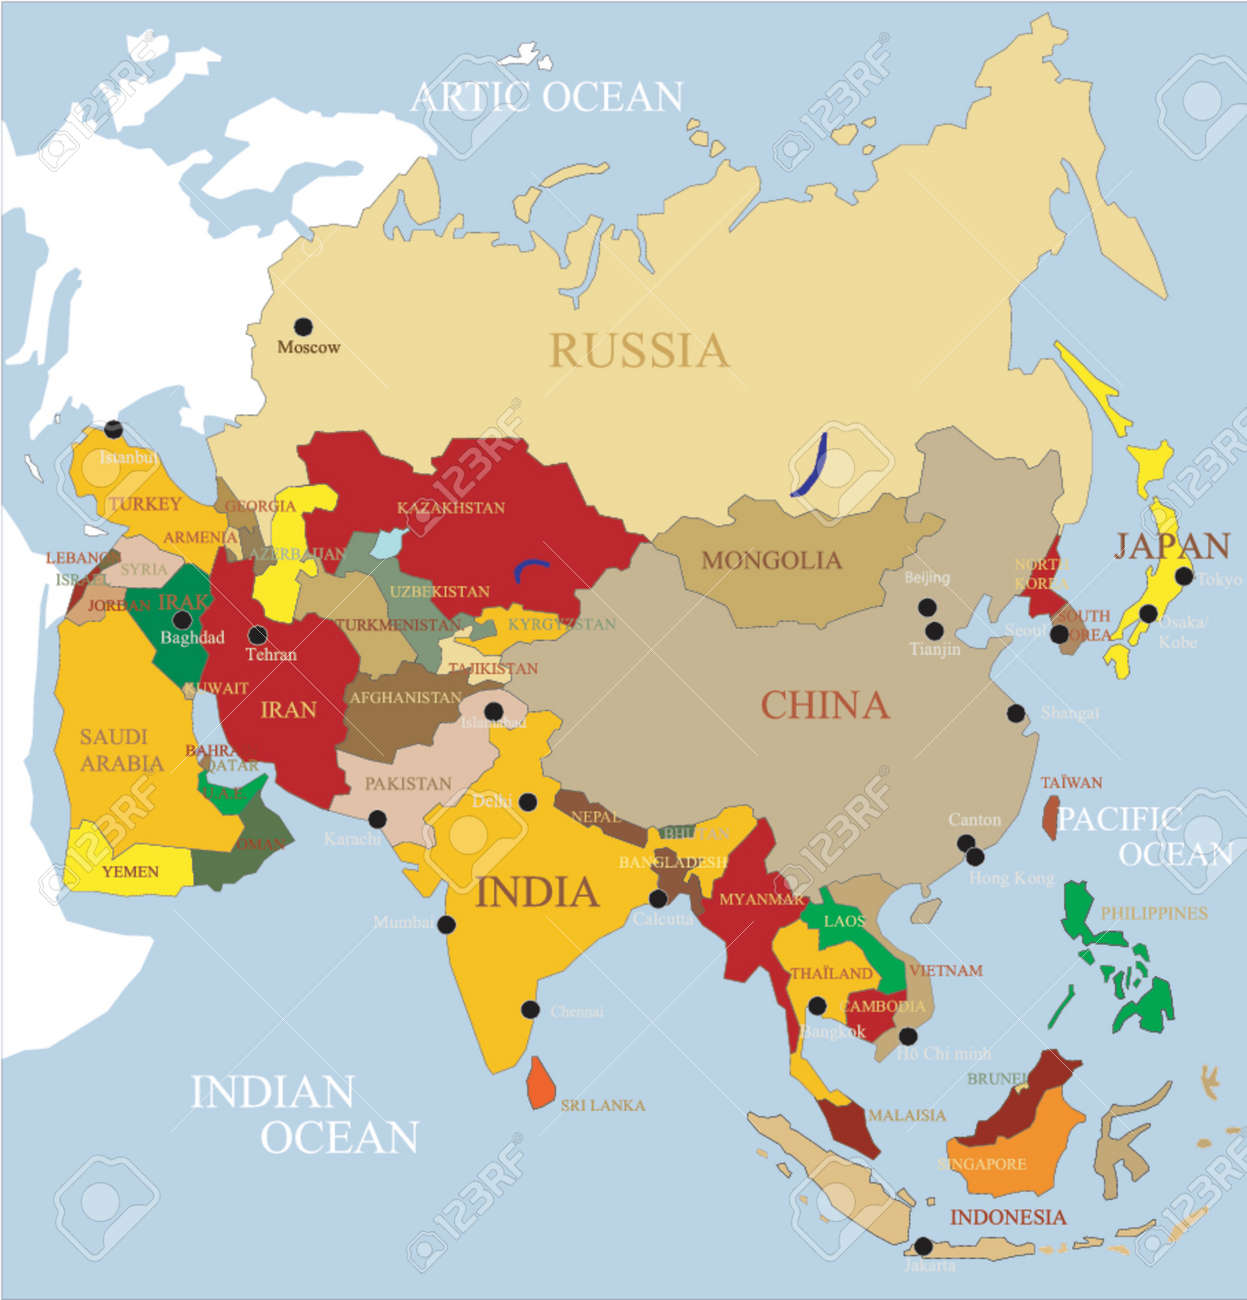 Karte Asien.Stock Photo